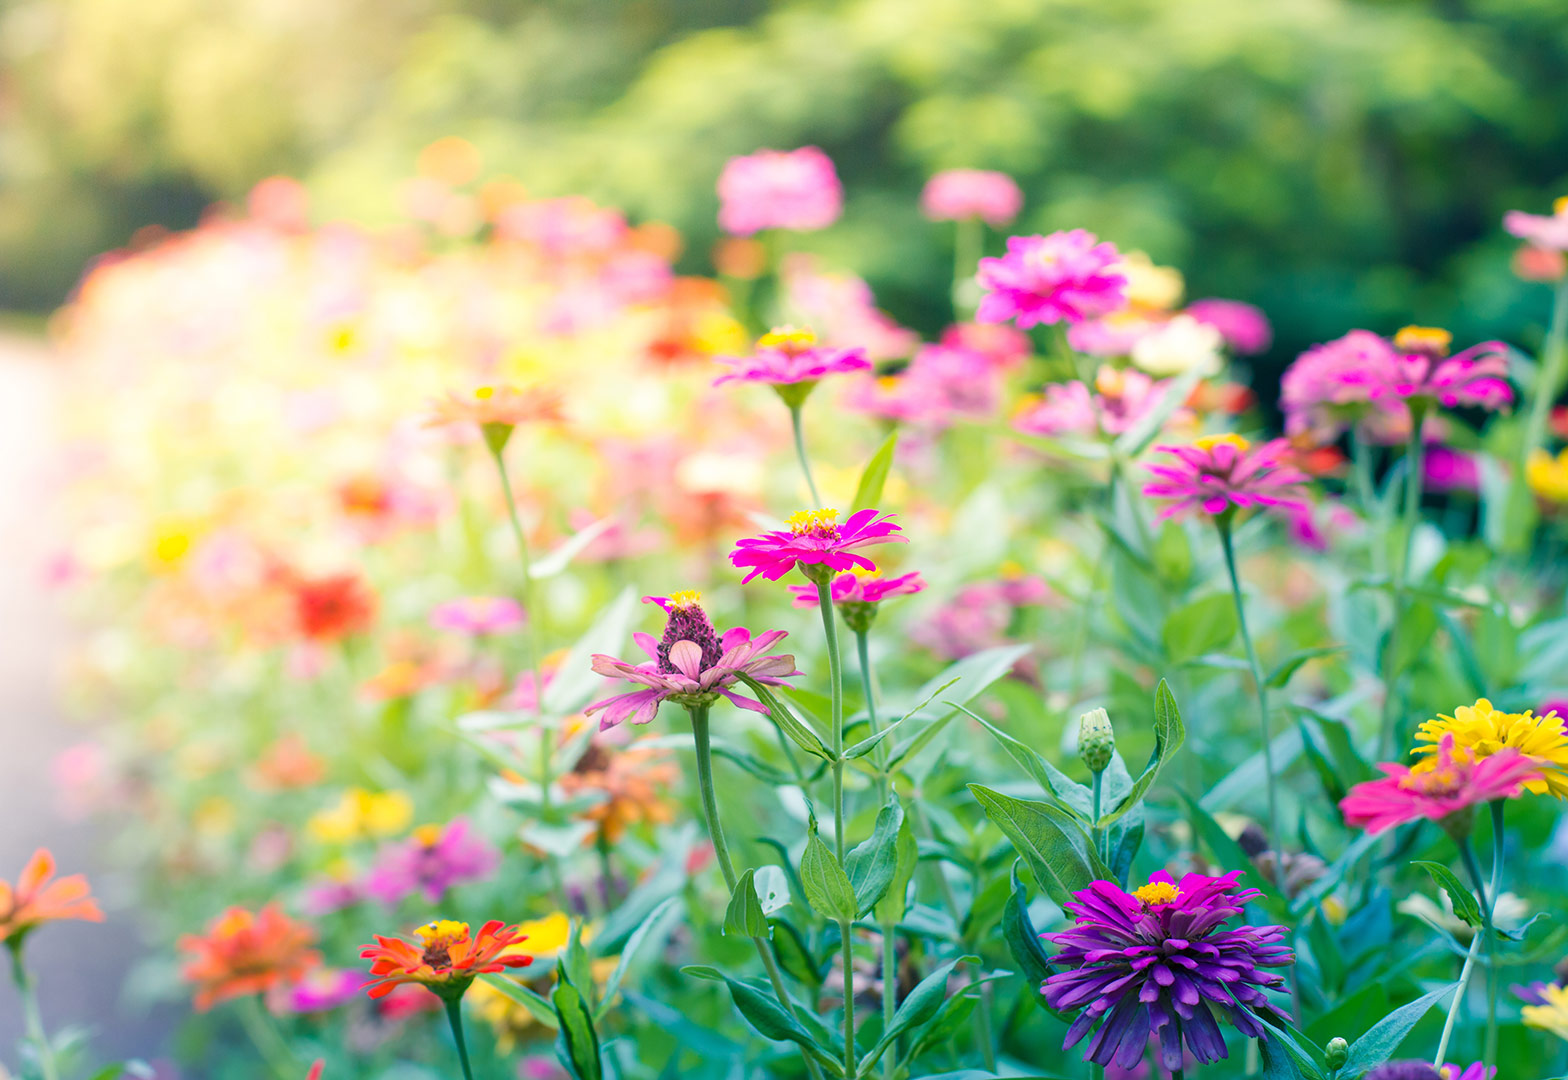 image-of-garden-flower-bed